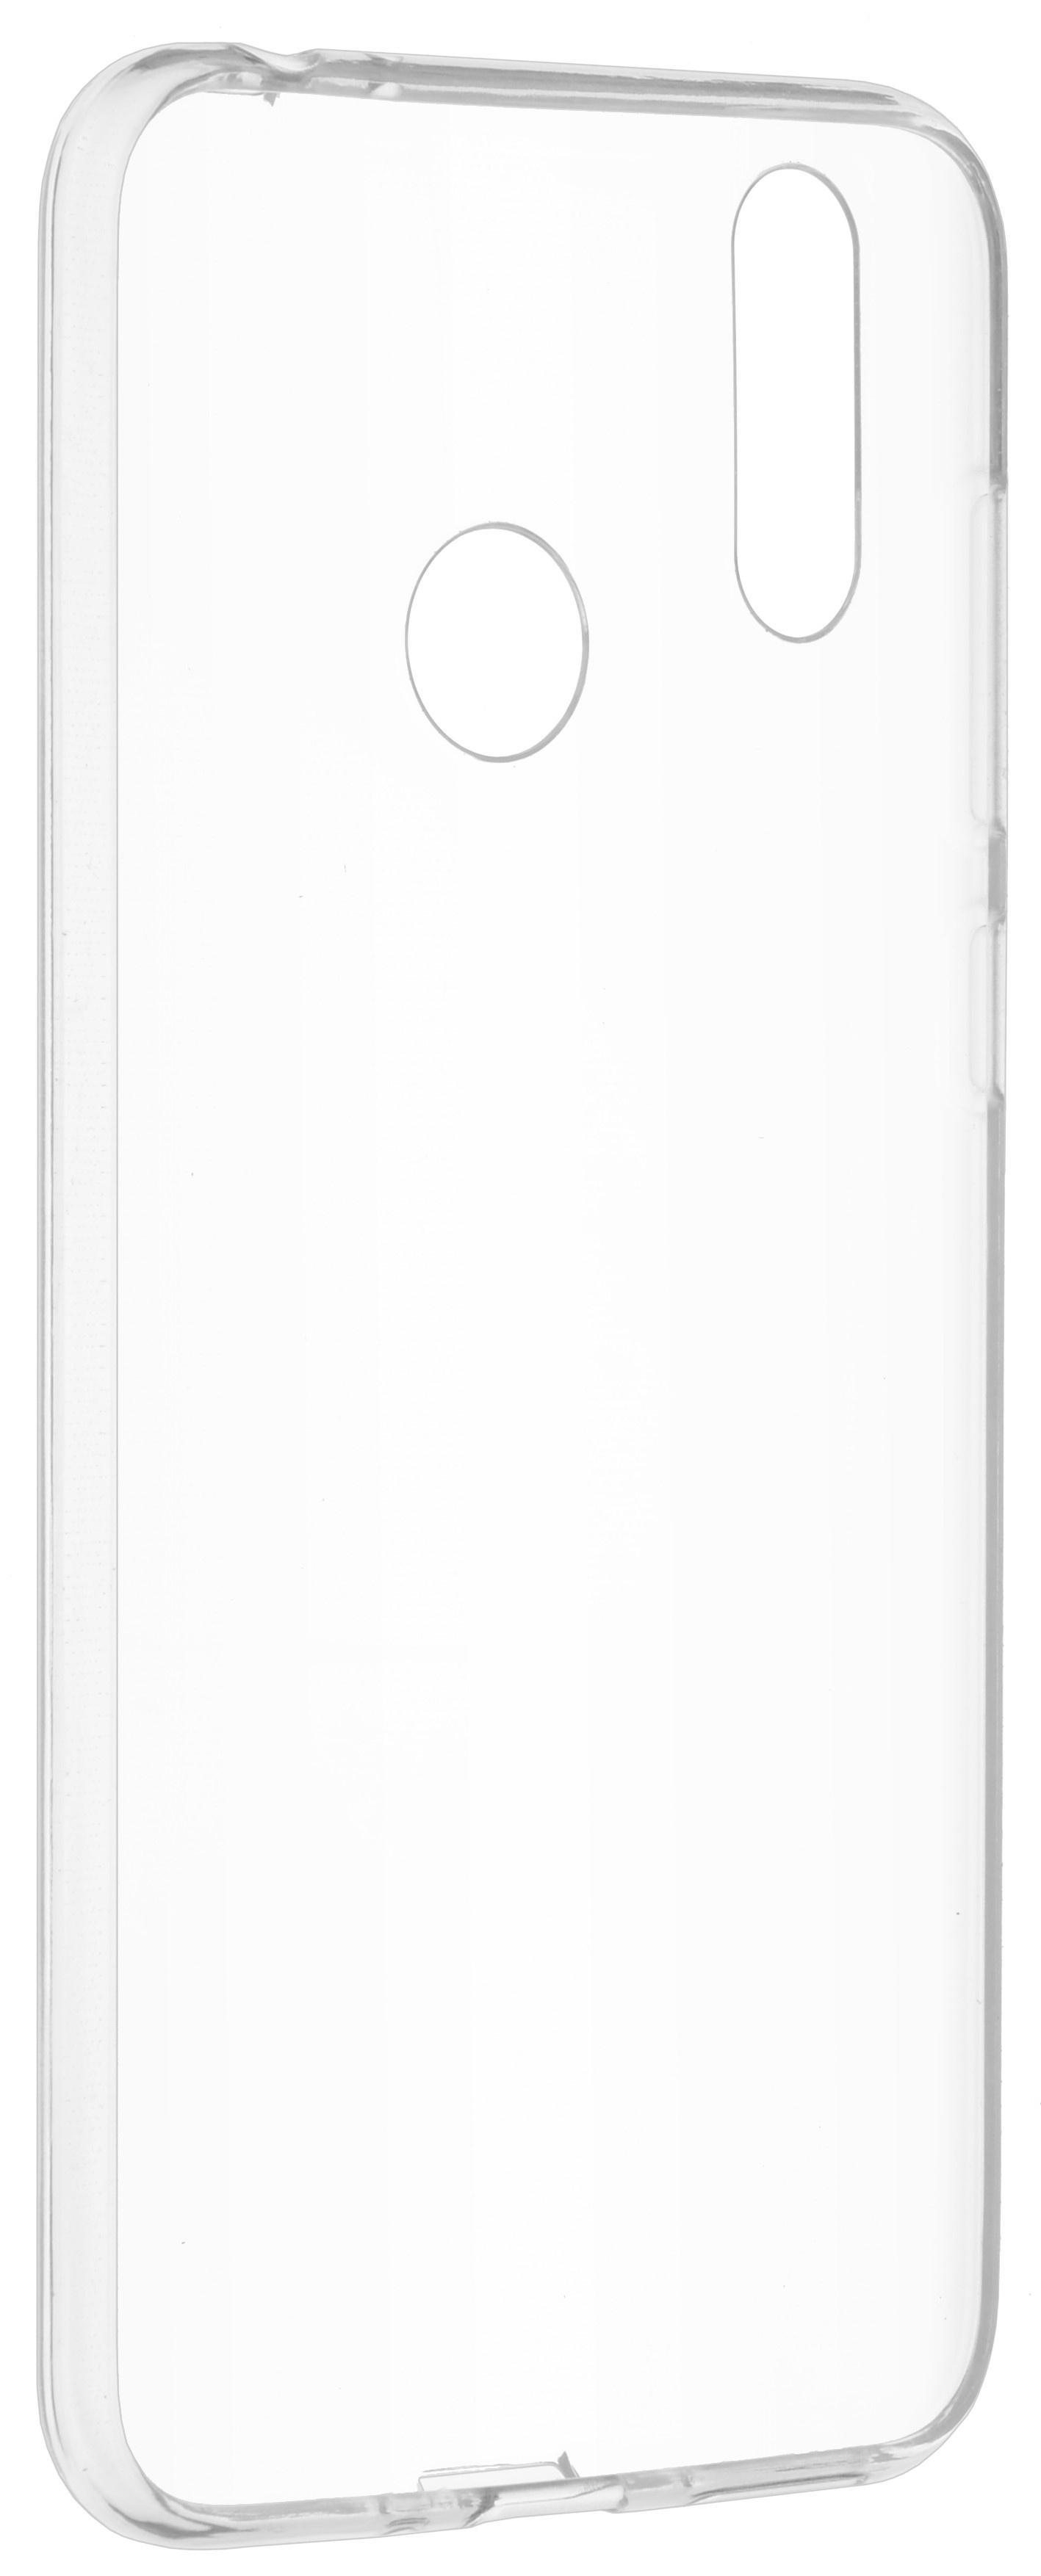 Накладка Skinbox Slim Silicone для Honor 8C, 4630042521971, прозрачный skinbox накладка skinbox slim silicone для lg v20